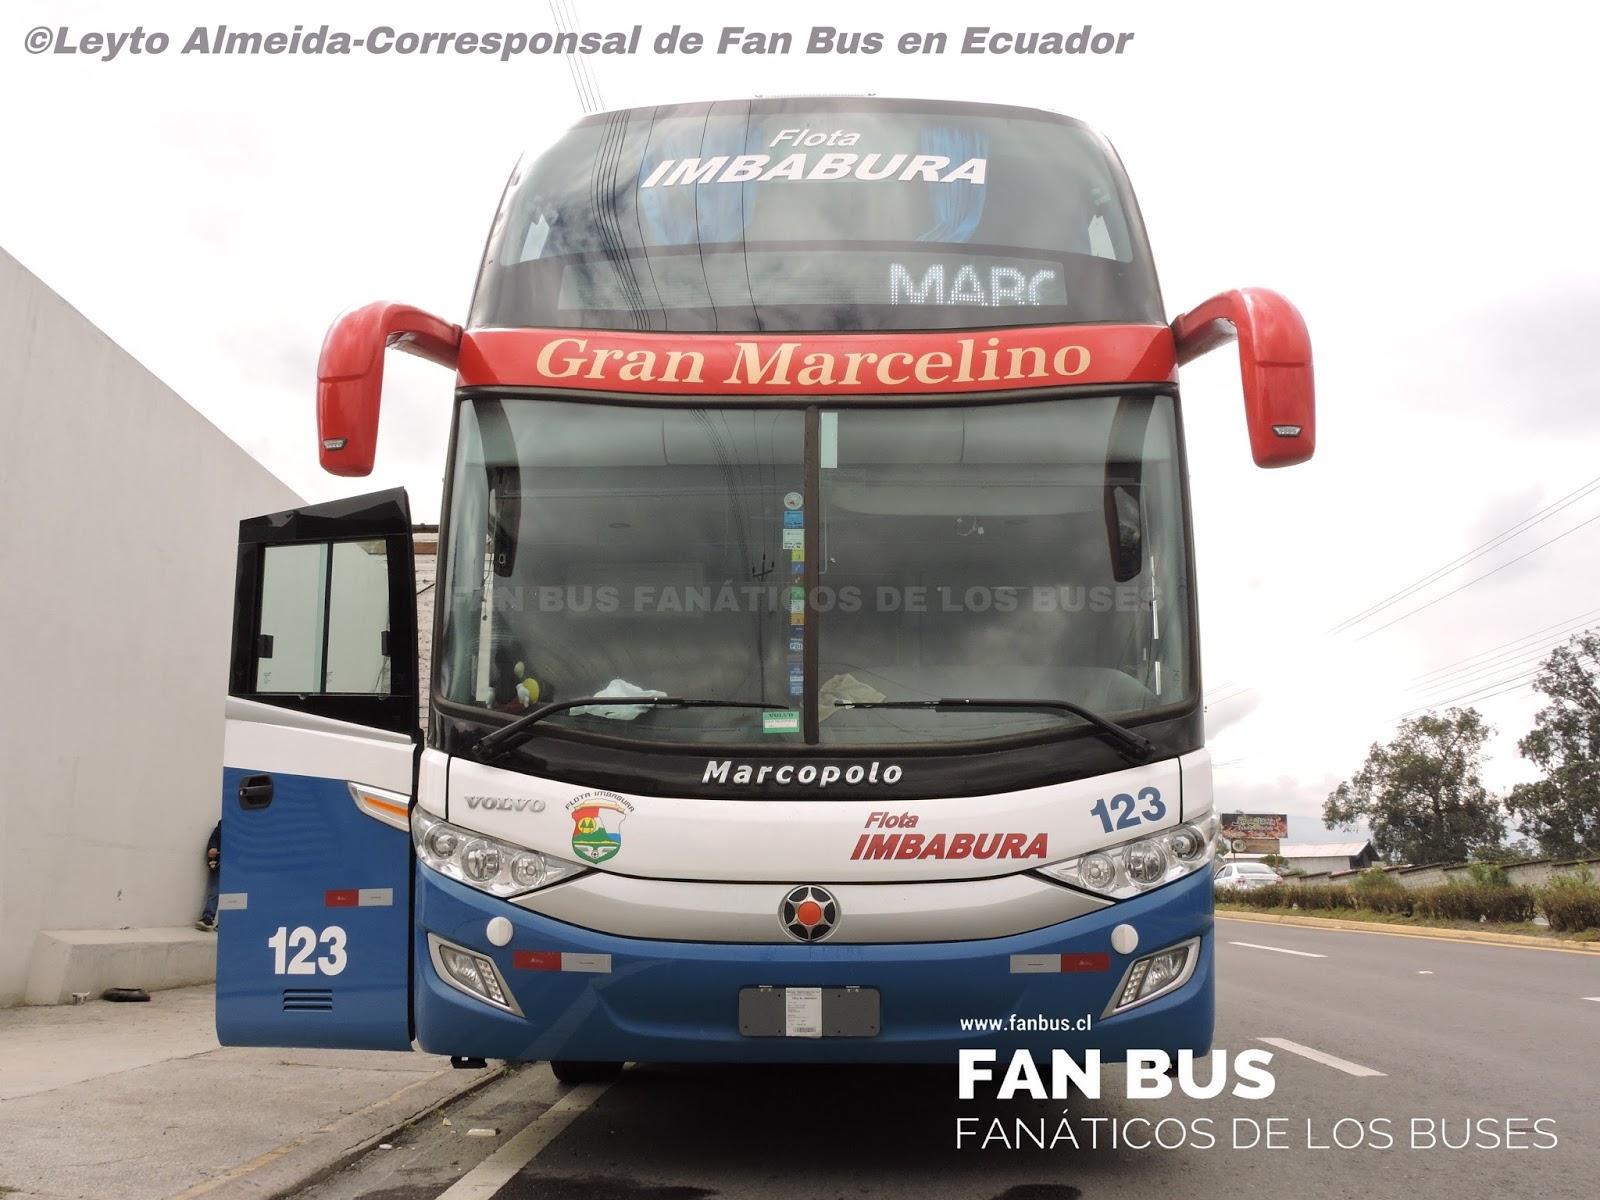 Ecuador sigue incorporando buses de dos pisos 8x2 - Fan Bus